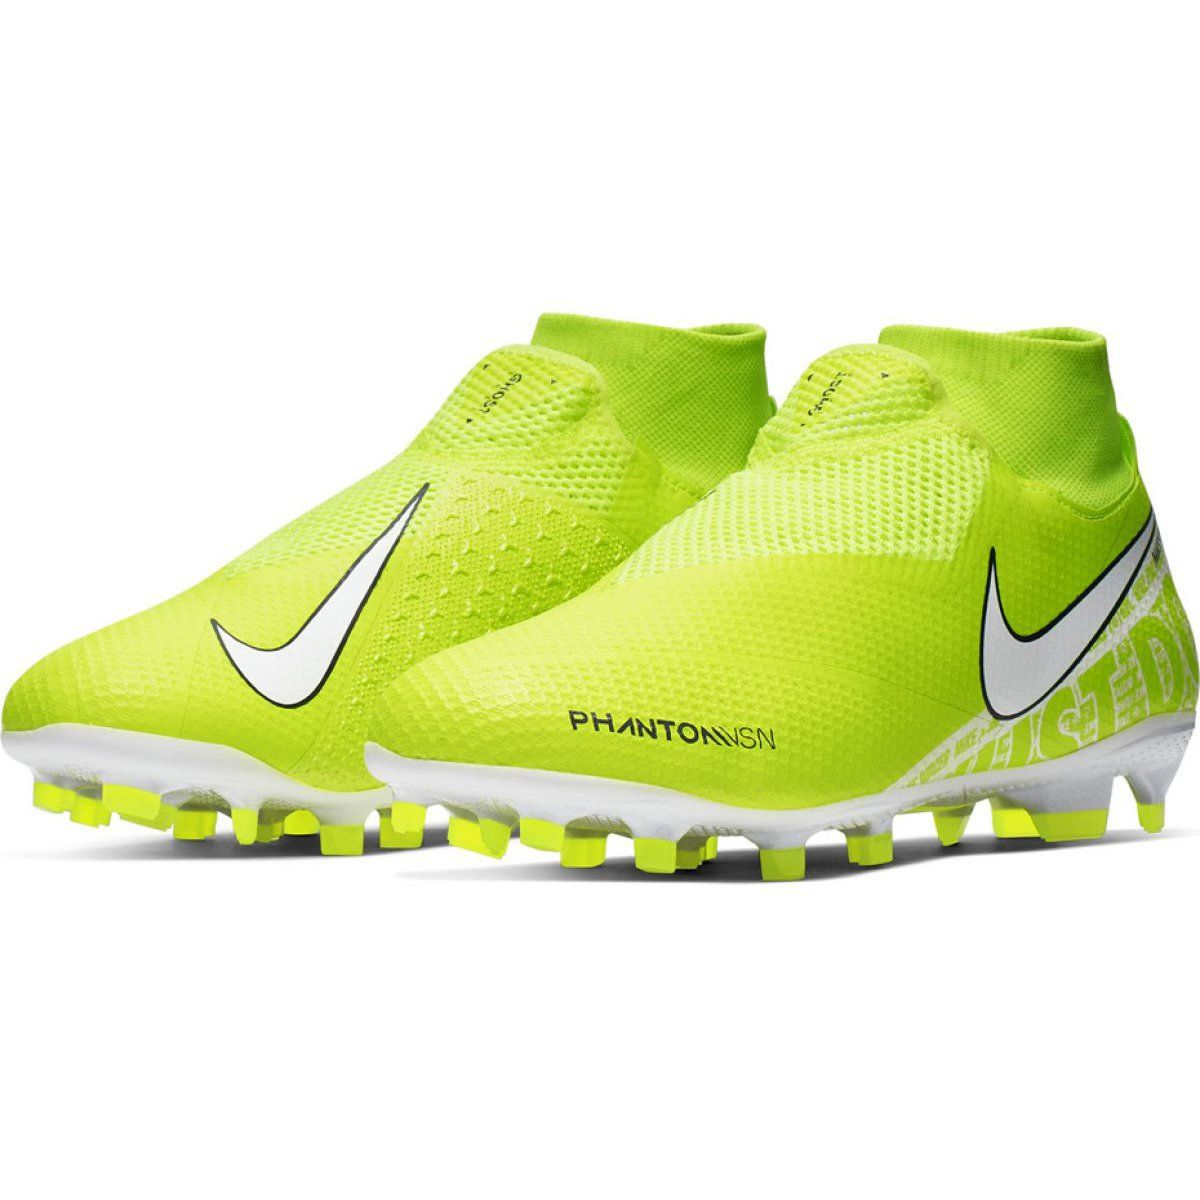 Buty Pilkarskie Nike Phantom Vsn Pro Df Fg M Ao3266 717 Zolte Zolte Football Shoes Nike Mens Football Boots